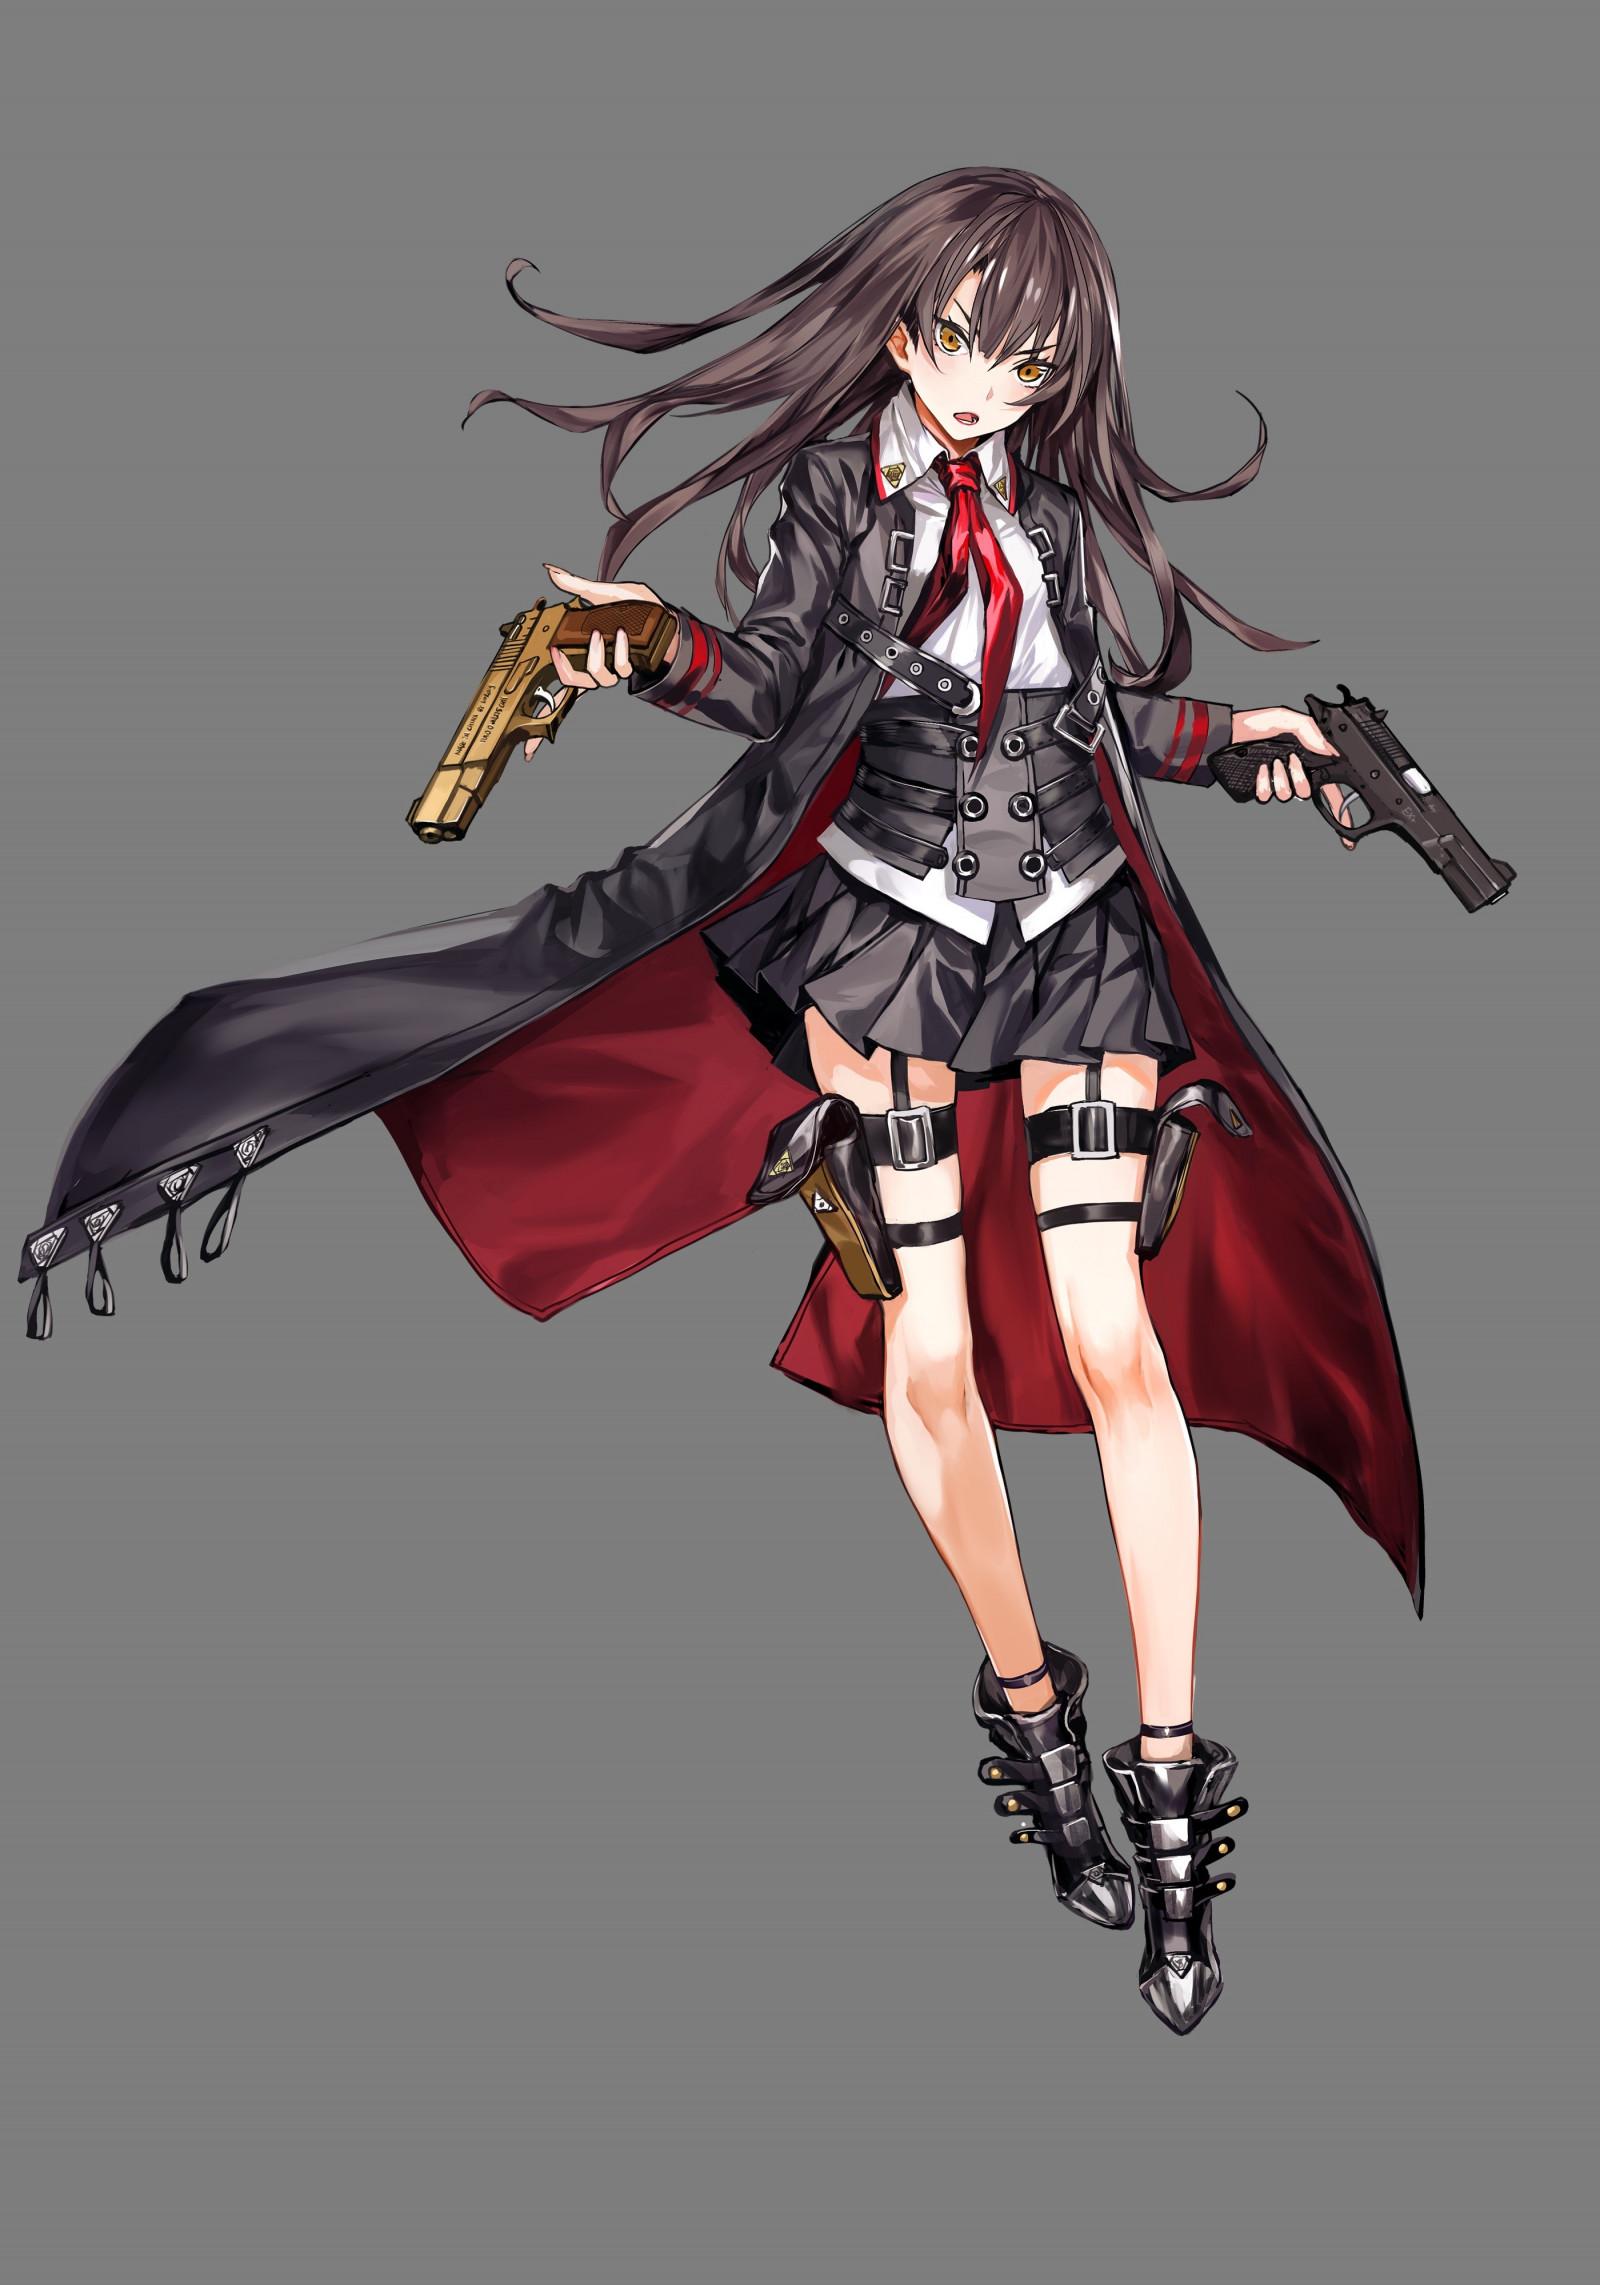 Girl With Sword Wallpaper Fondos De Pantalla Ilustraci 243 N Pistola Pelo Largo